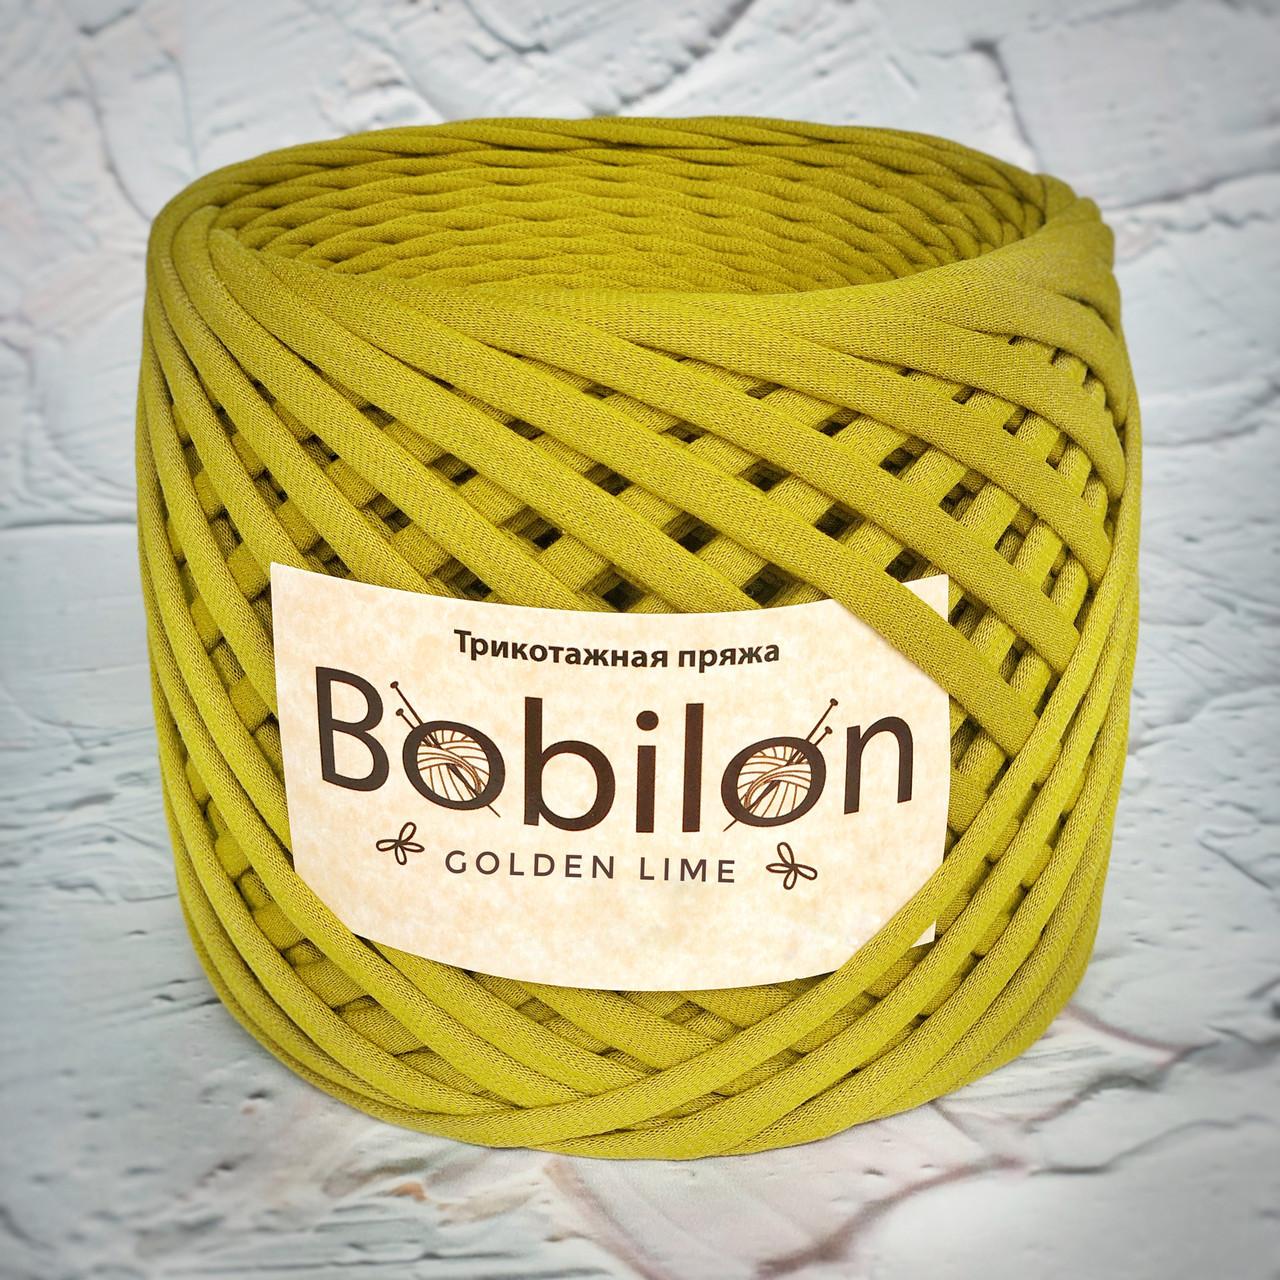 Трикотажная пряжа Bobilon Mini (5-7мм).  Golden Lime